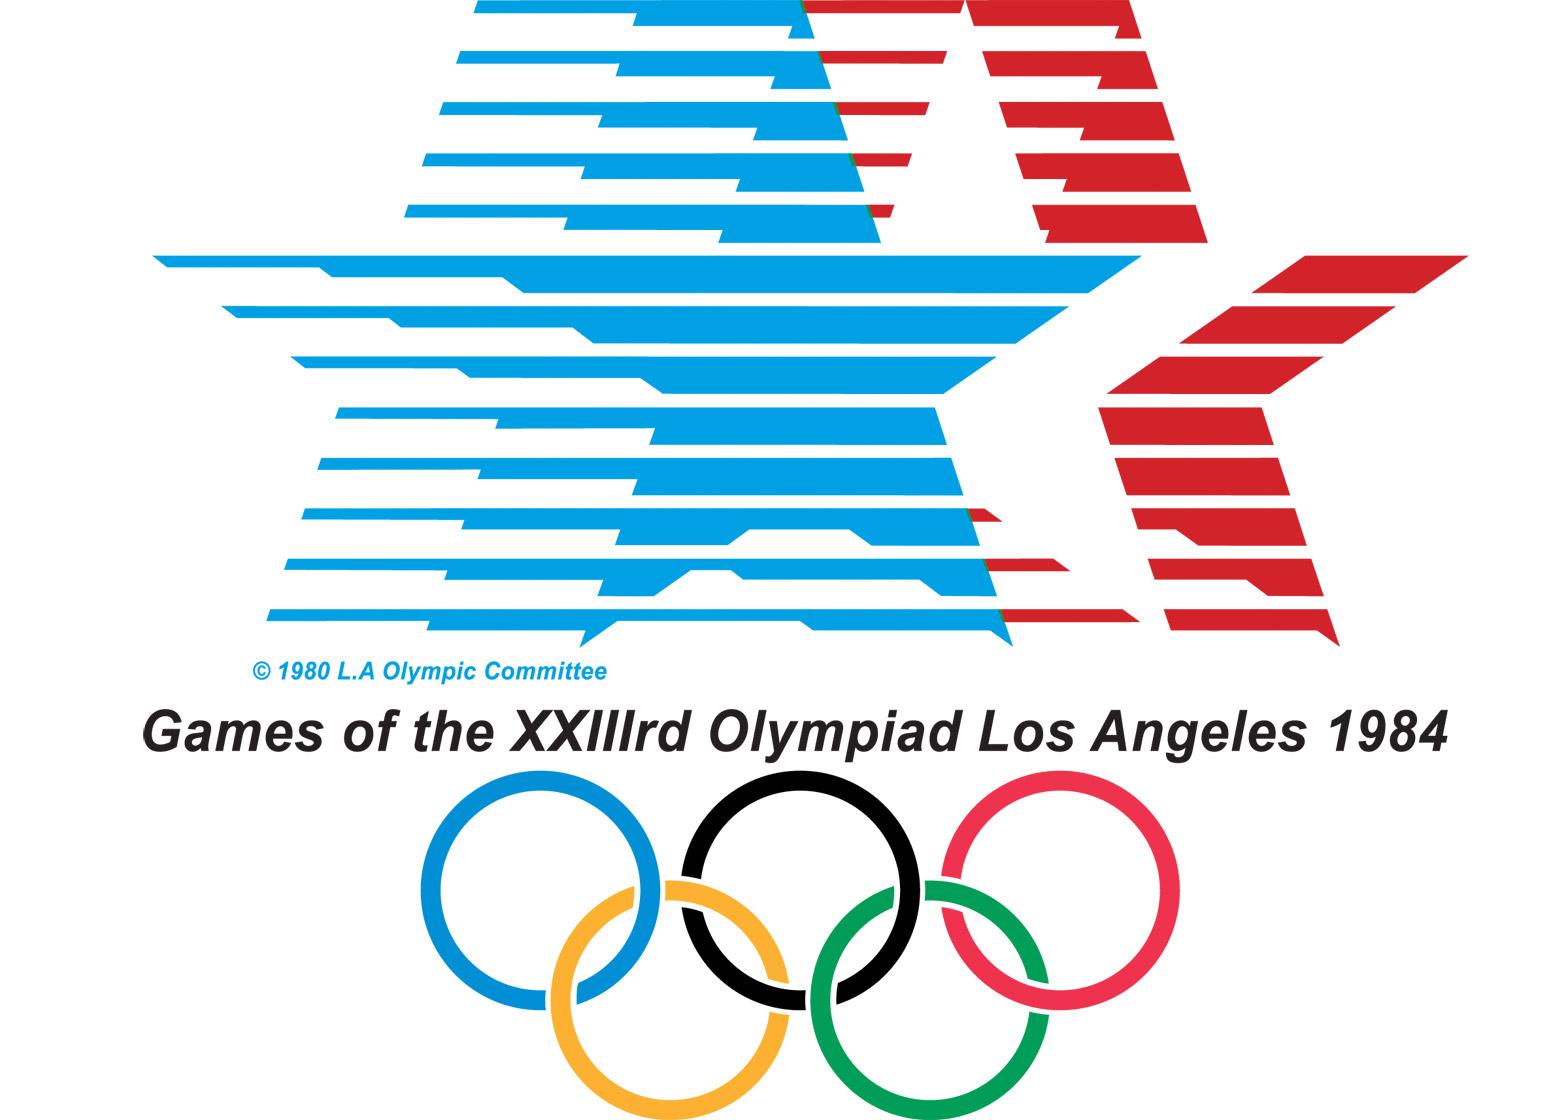 Logo of the 1984 Los Angeles Olympics